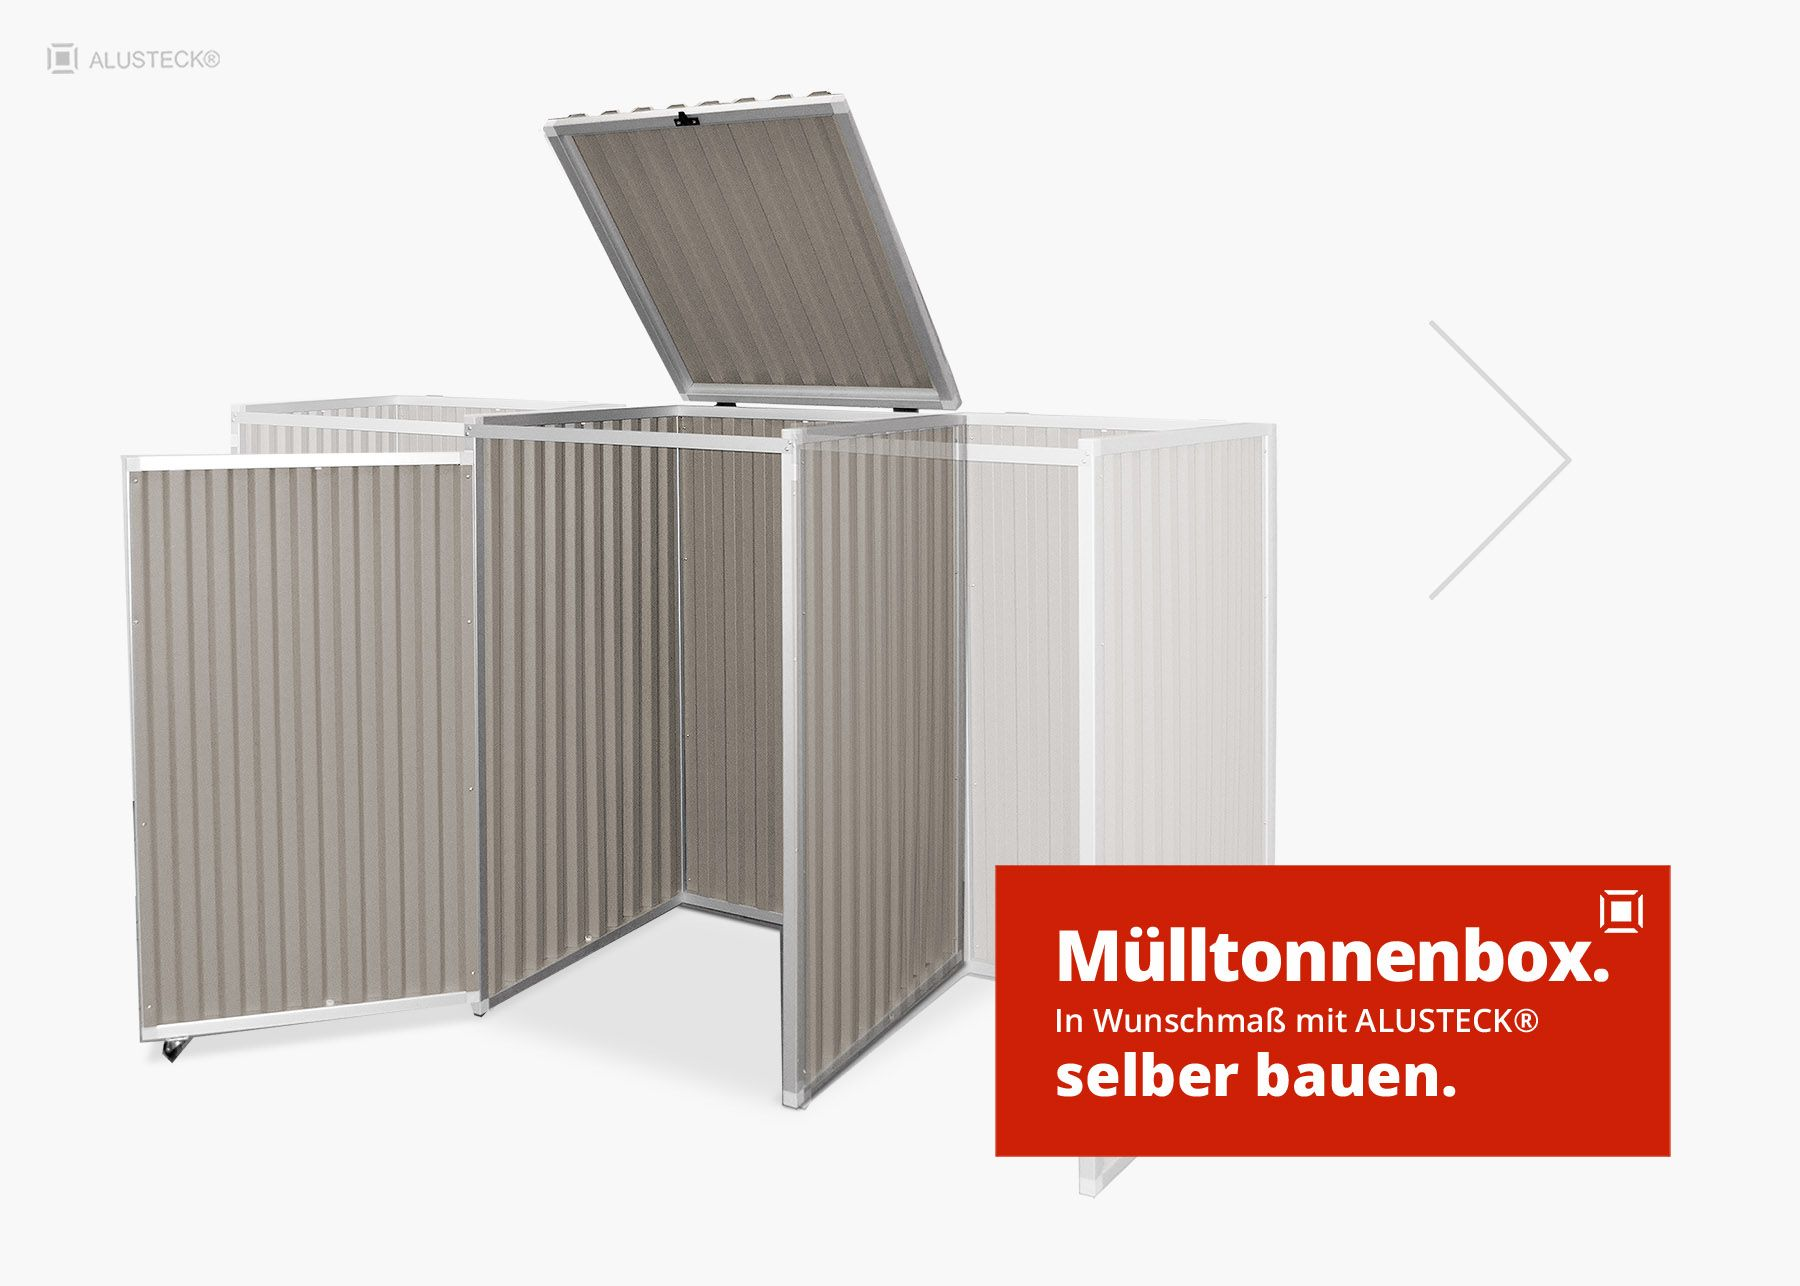 Beliebt Mülltonnenbox selber bauen mit ALUSTECK® Bauanleitung JW75